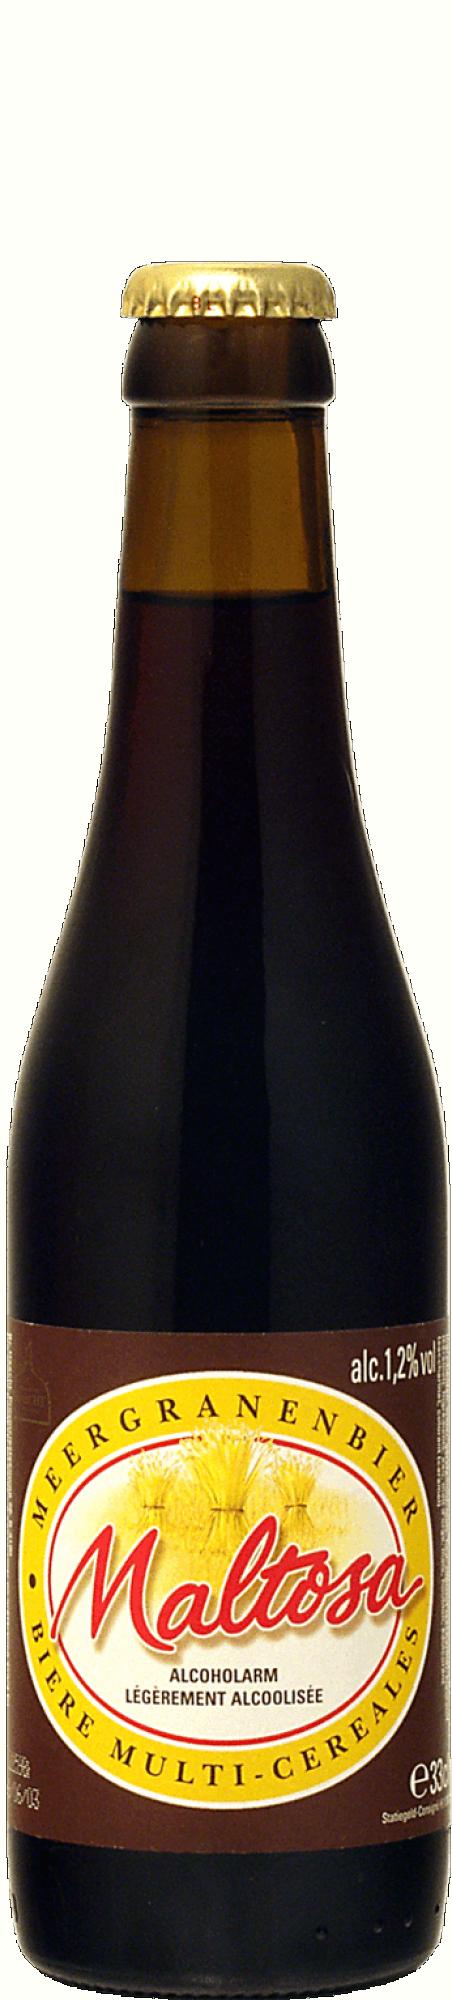 Maltosa 33cl Fles (1.2%) - Bestelonline